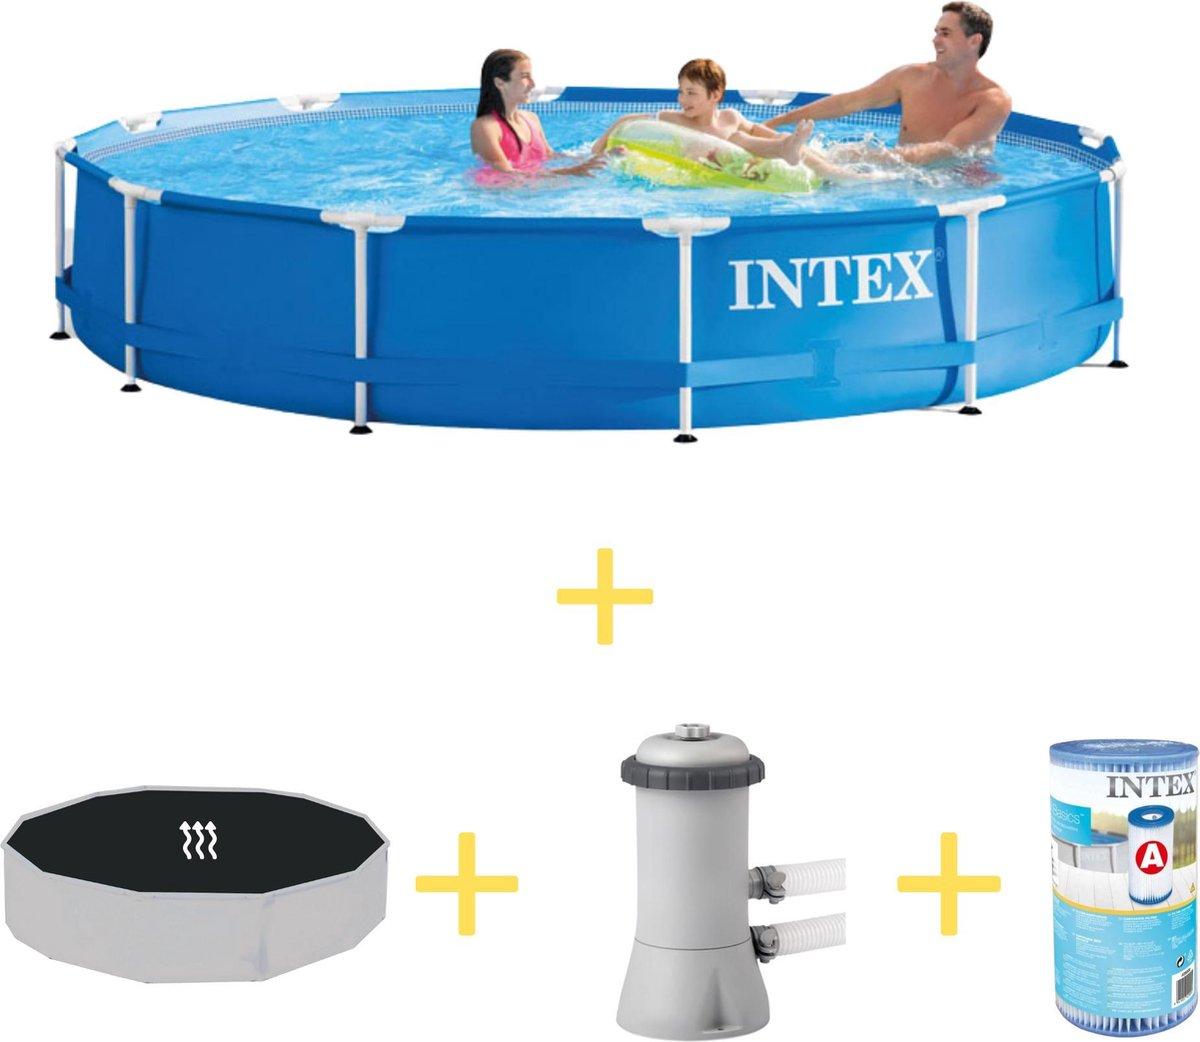 Intex Zwembad - Metal Frame - 366 x 76 cm - Inclusief Solarzeil, Filterpomp & Filter